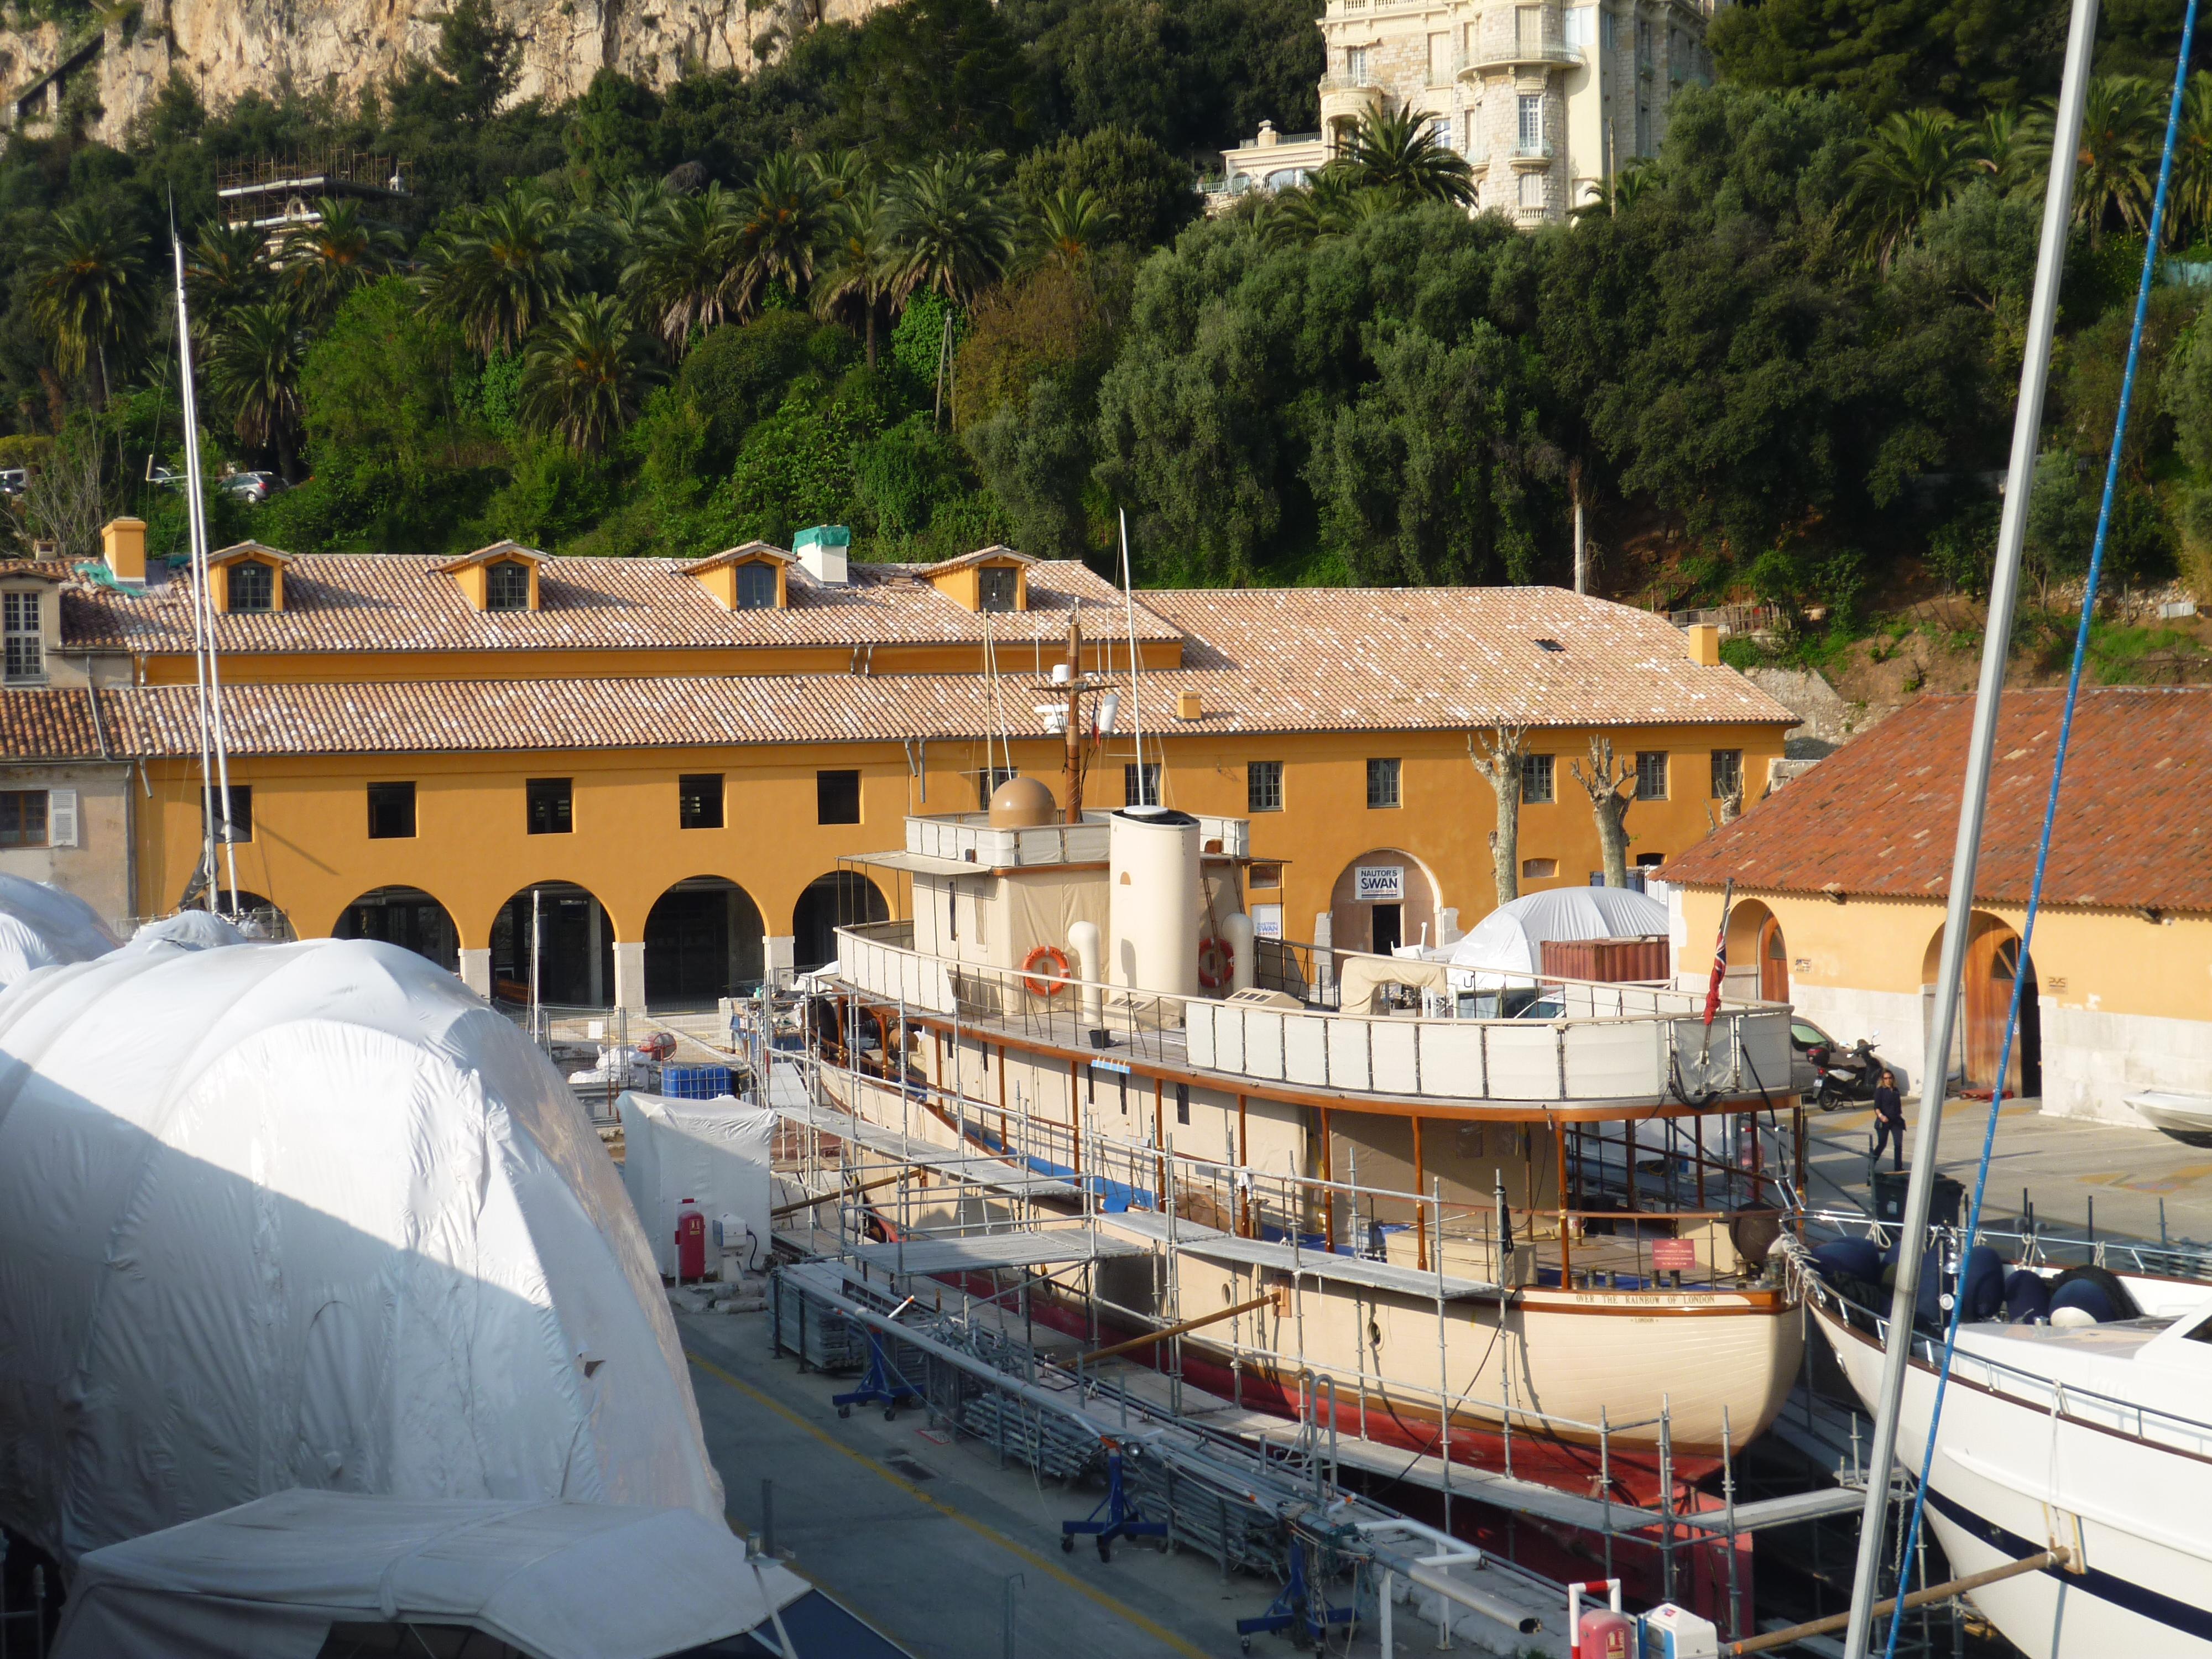 File vieille forge darse de villefranche sur mer jpg wikimedia commons - Port de la darse villefranche sur mer ...